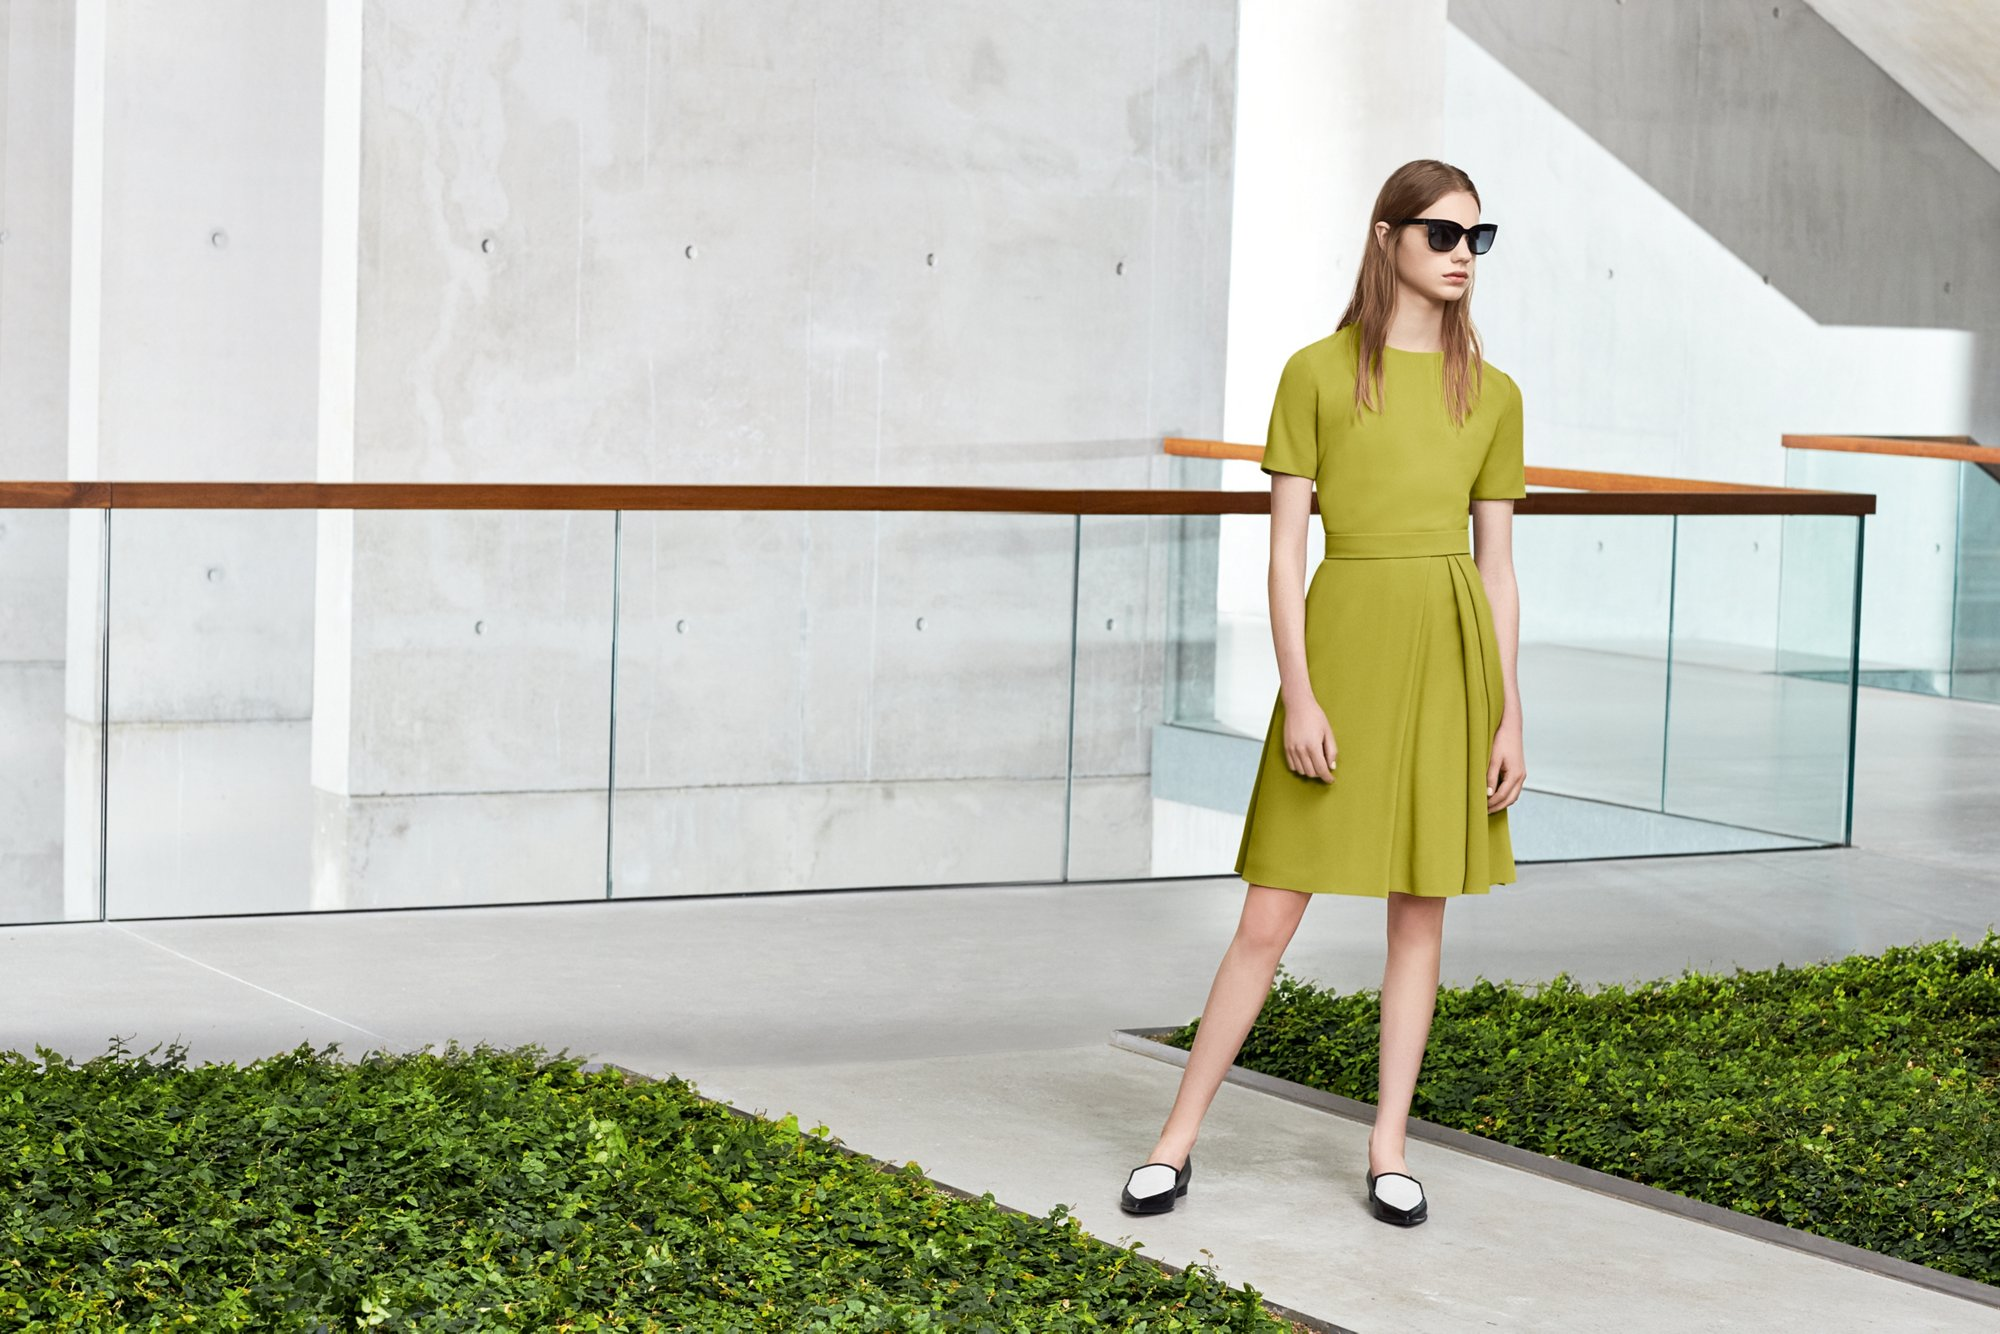 Green dress by BOSS